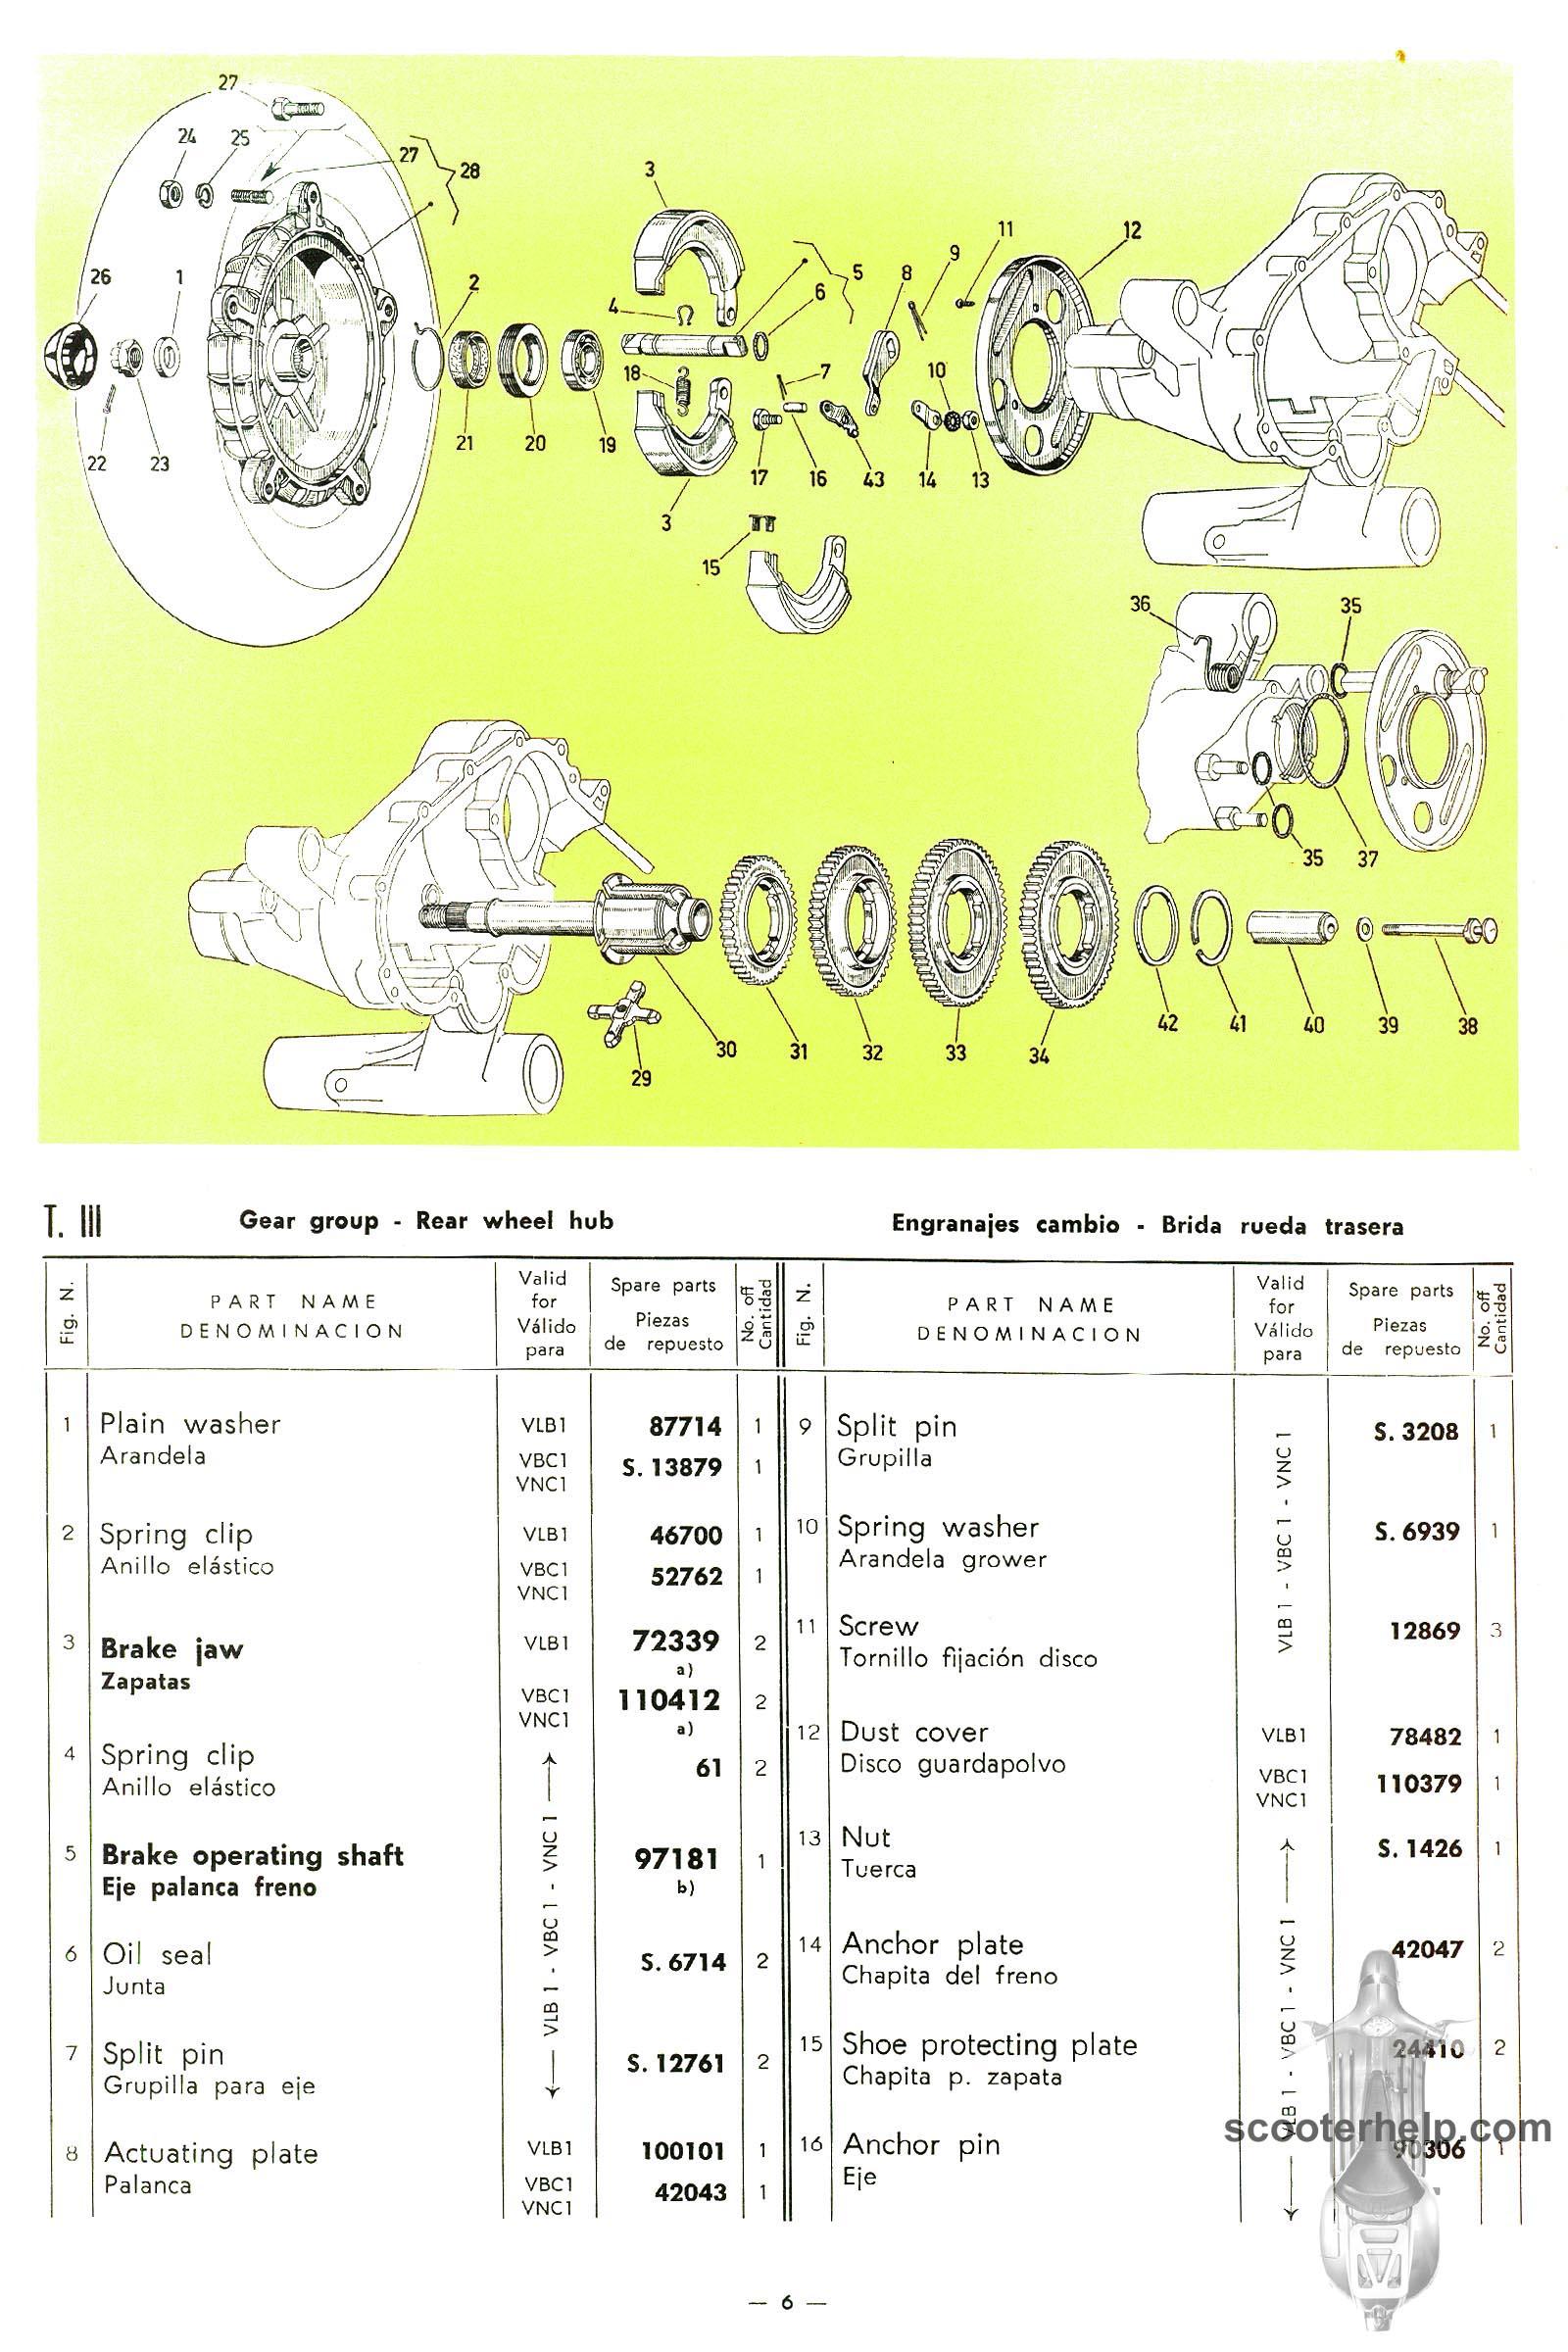 Vespa 150 super 150 sprint 125 super parts manual or click here for a 178mb pdf file asfbconference2016 Images